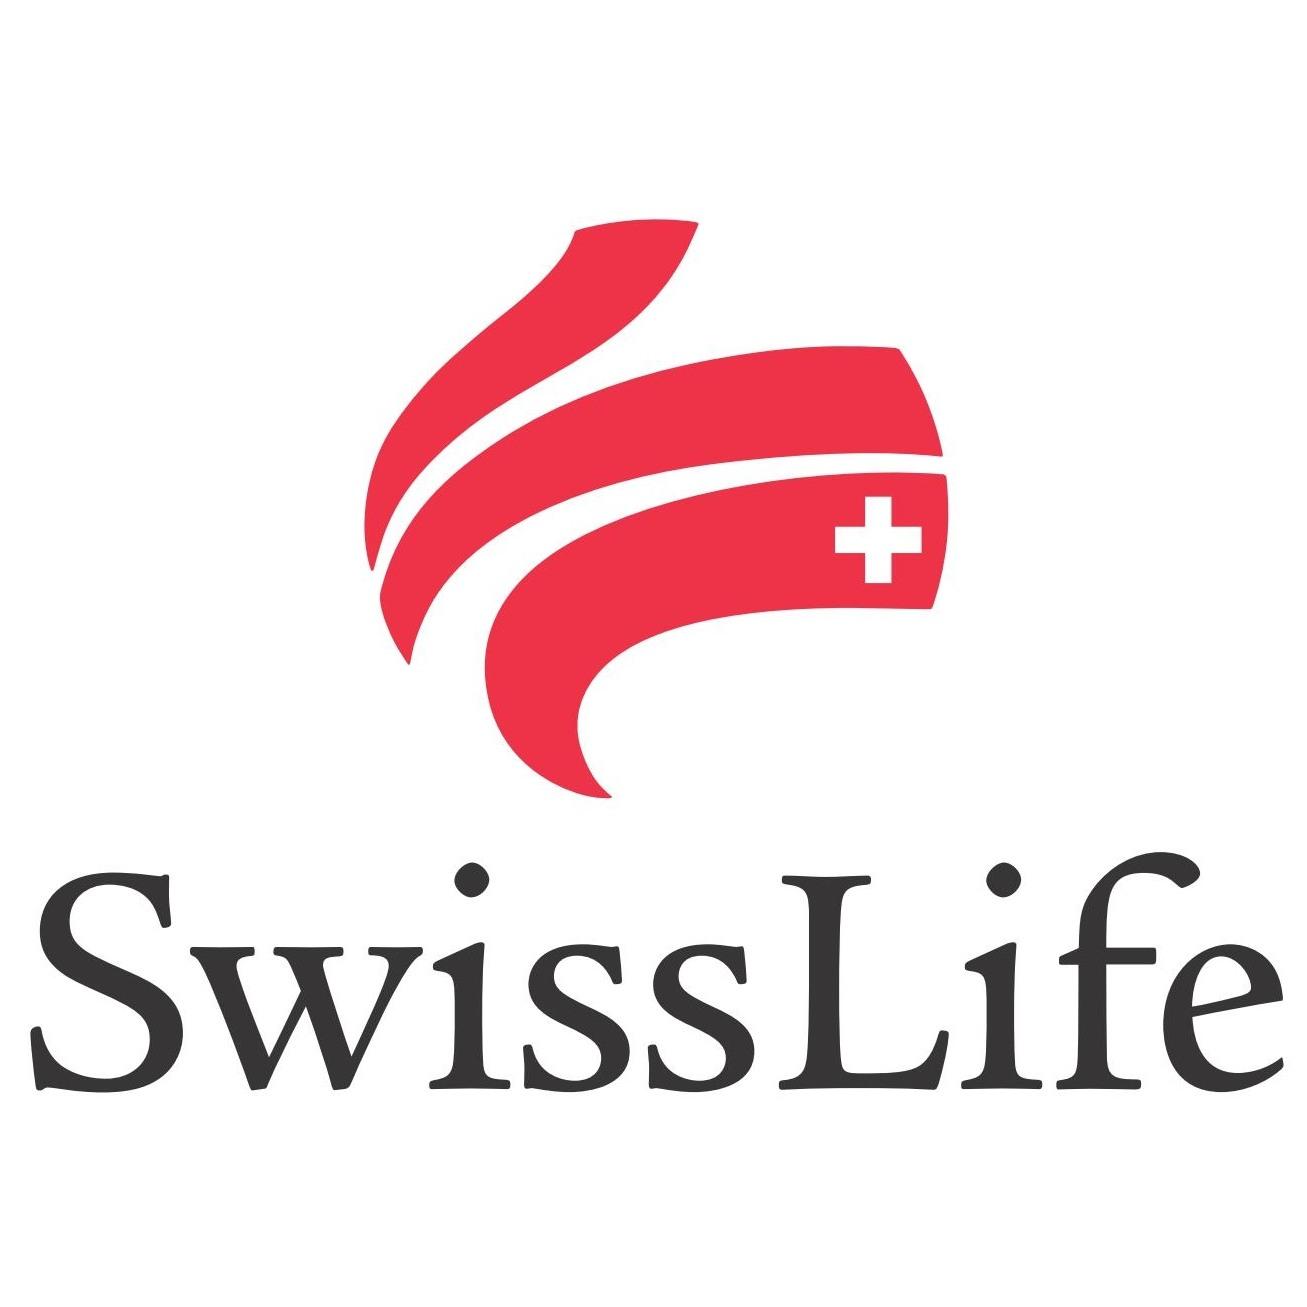 Swiss_Life_Logo